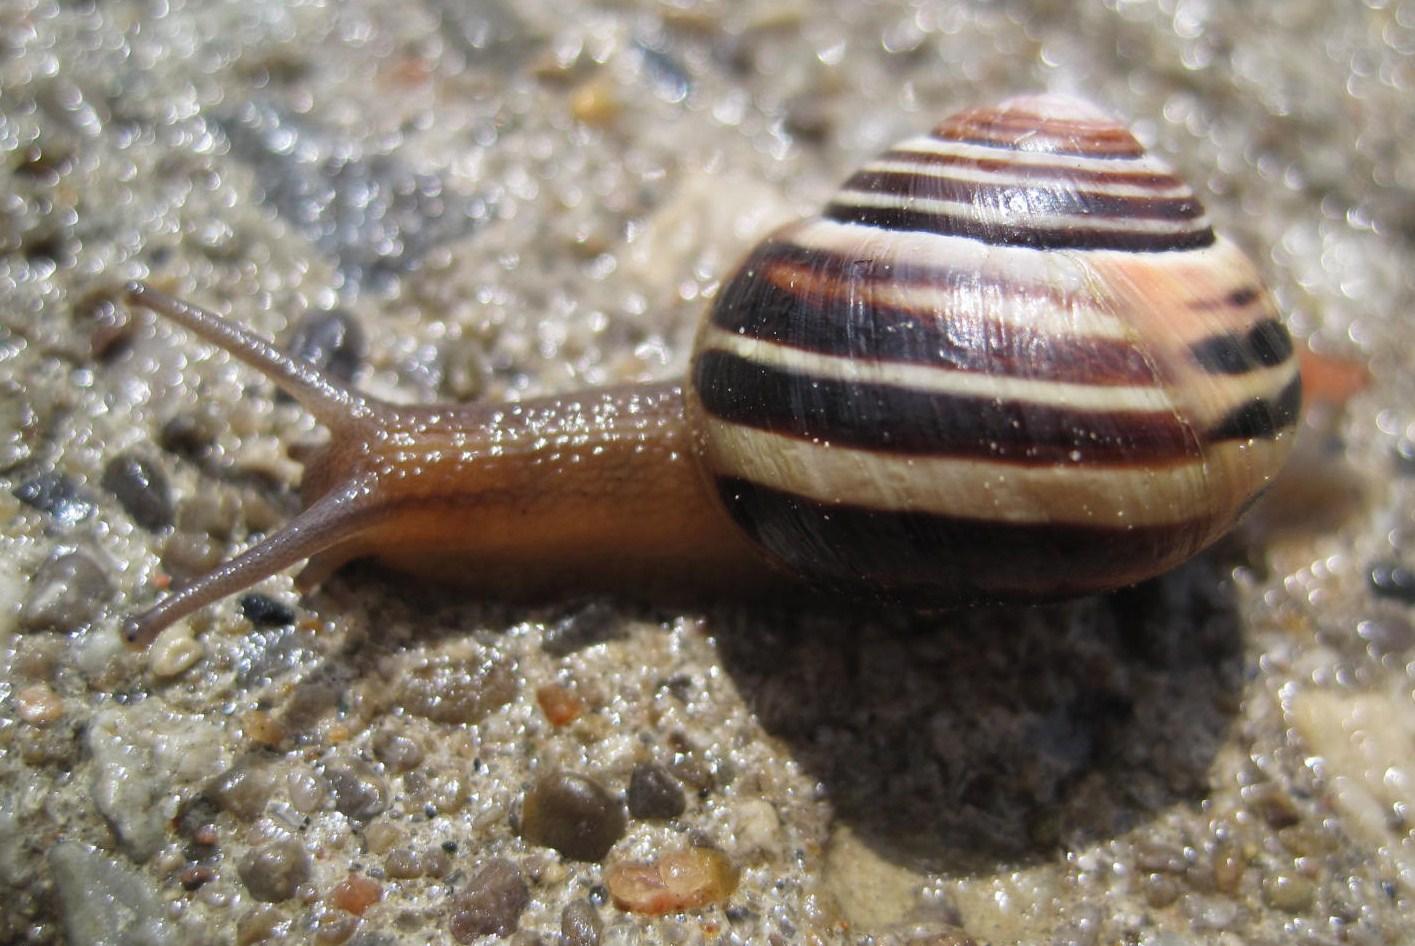 Snail on aggregate sidewalk